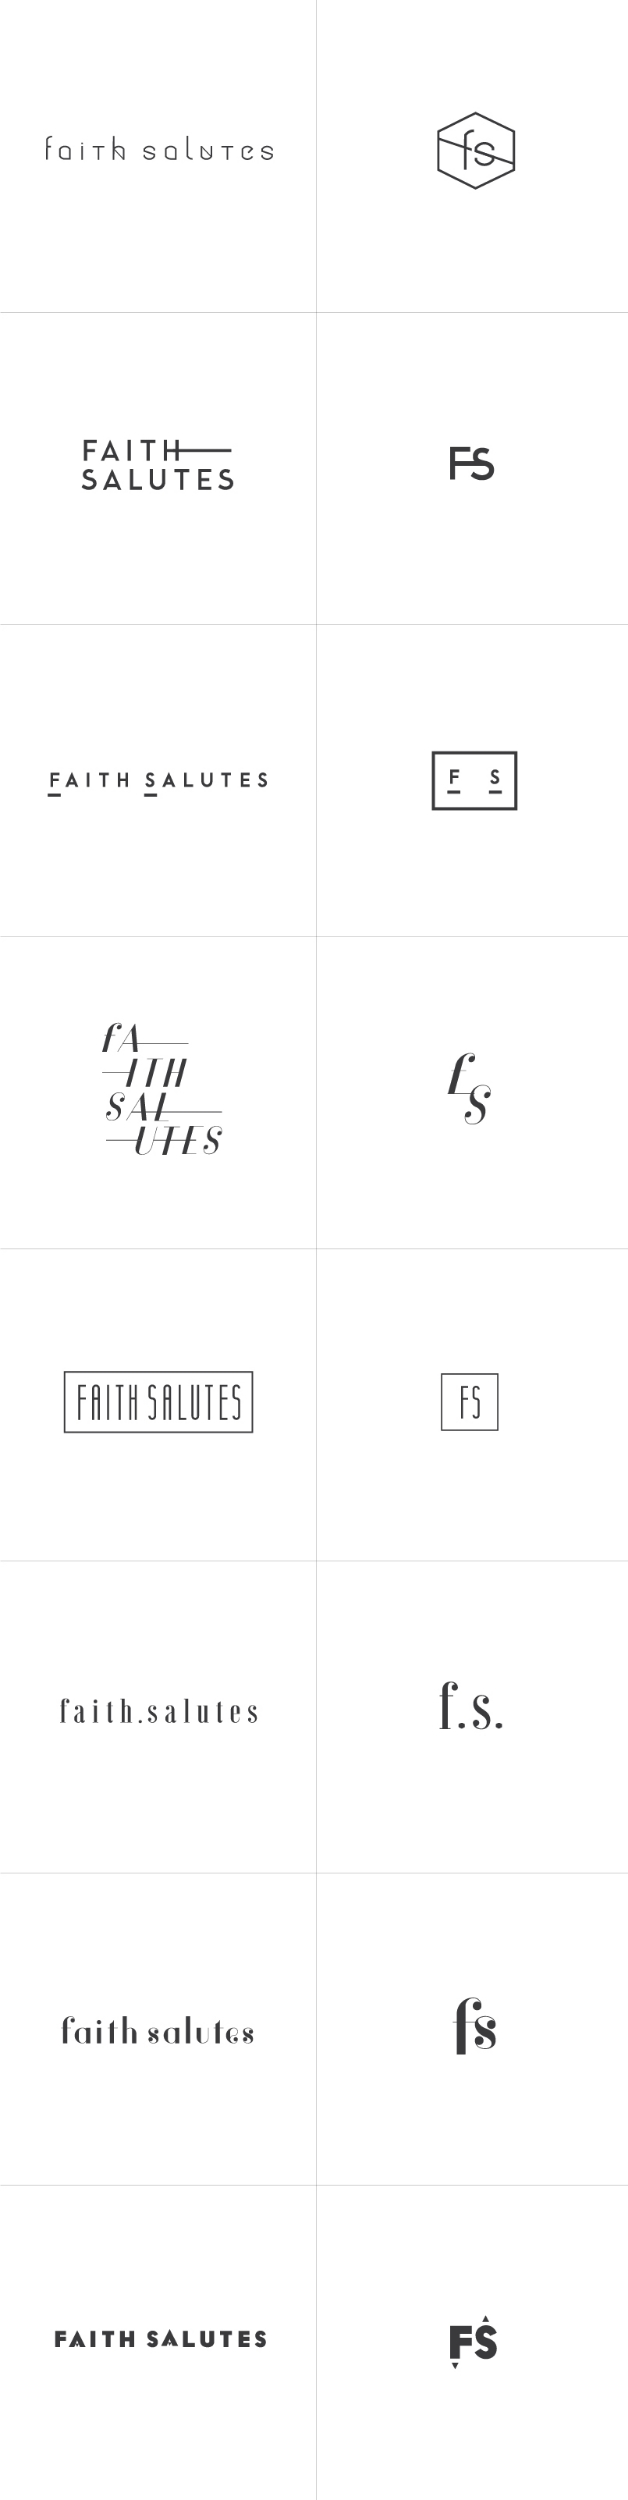 creative-riot-workinprogress-faithsaluteslogodesign.jpg